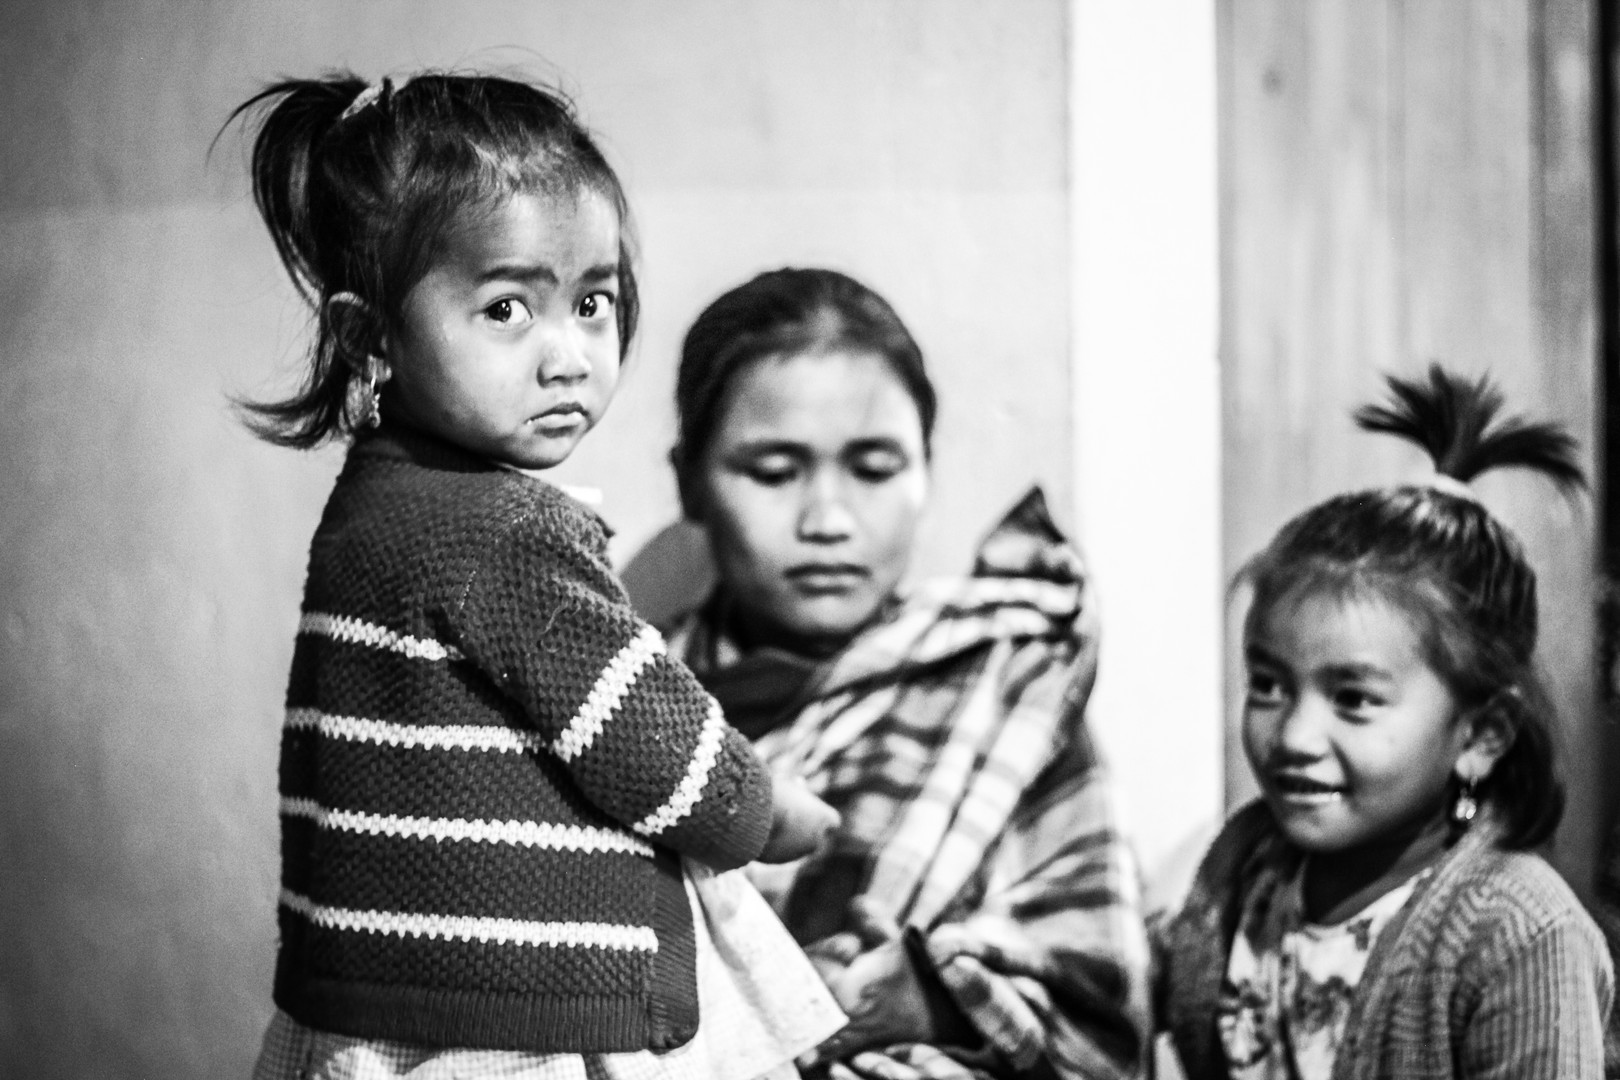 Family | Meghalaya, 2017